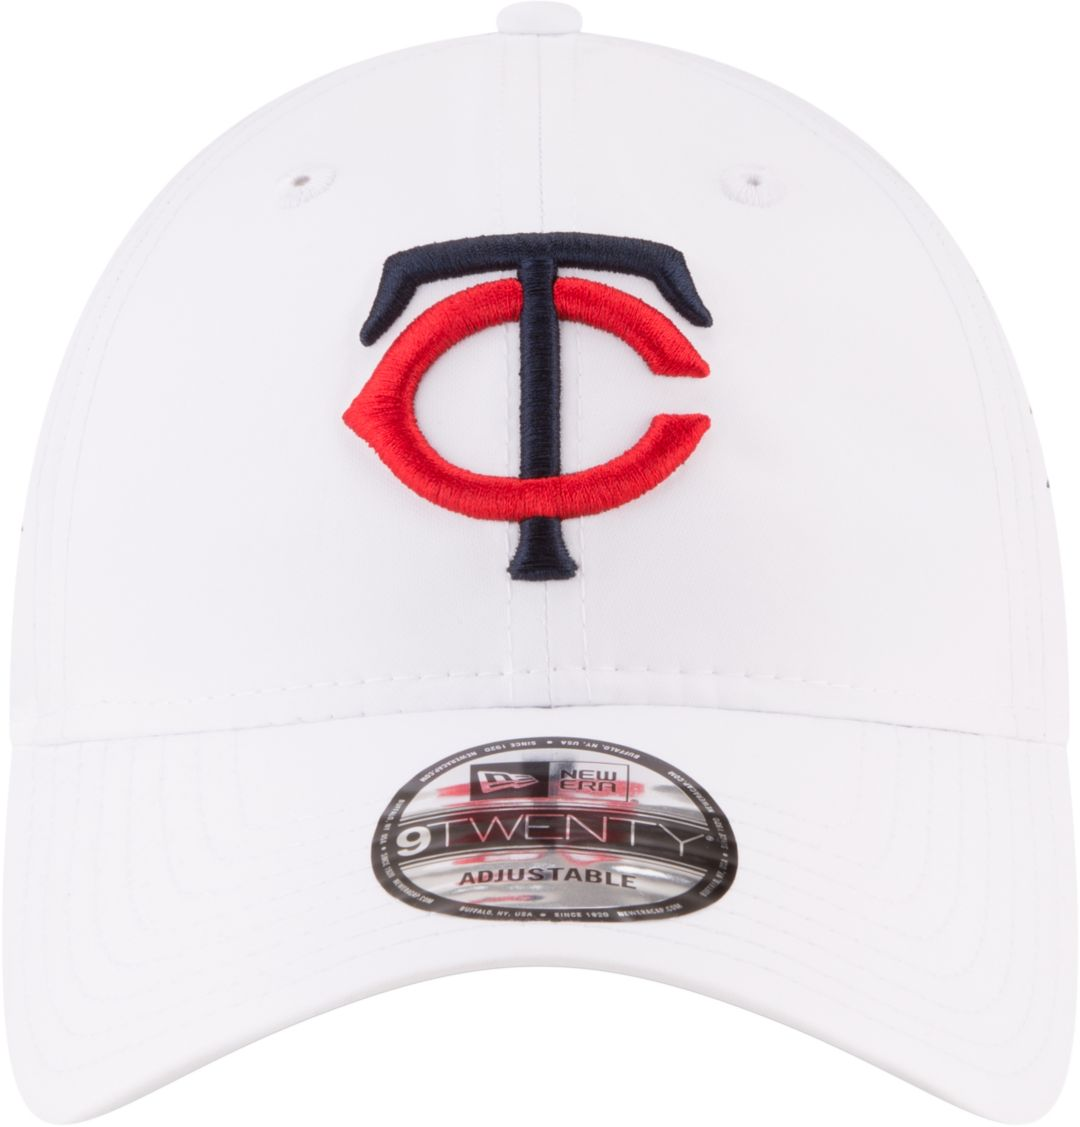 new arrival 1e14a d070b New Era Men s Minnesota Twins 9Twenty Adjustable Hat. noImageFound. Previous.  1. 2